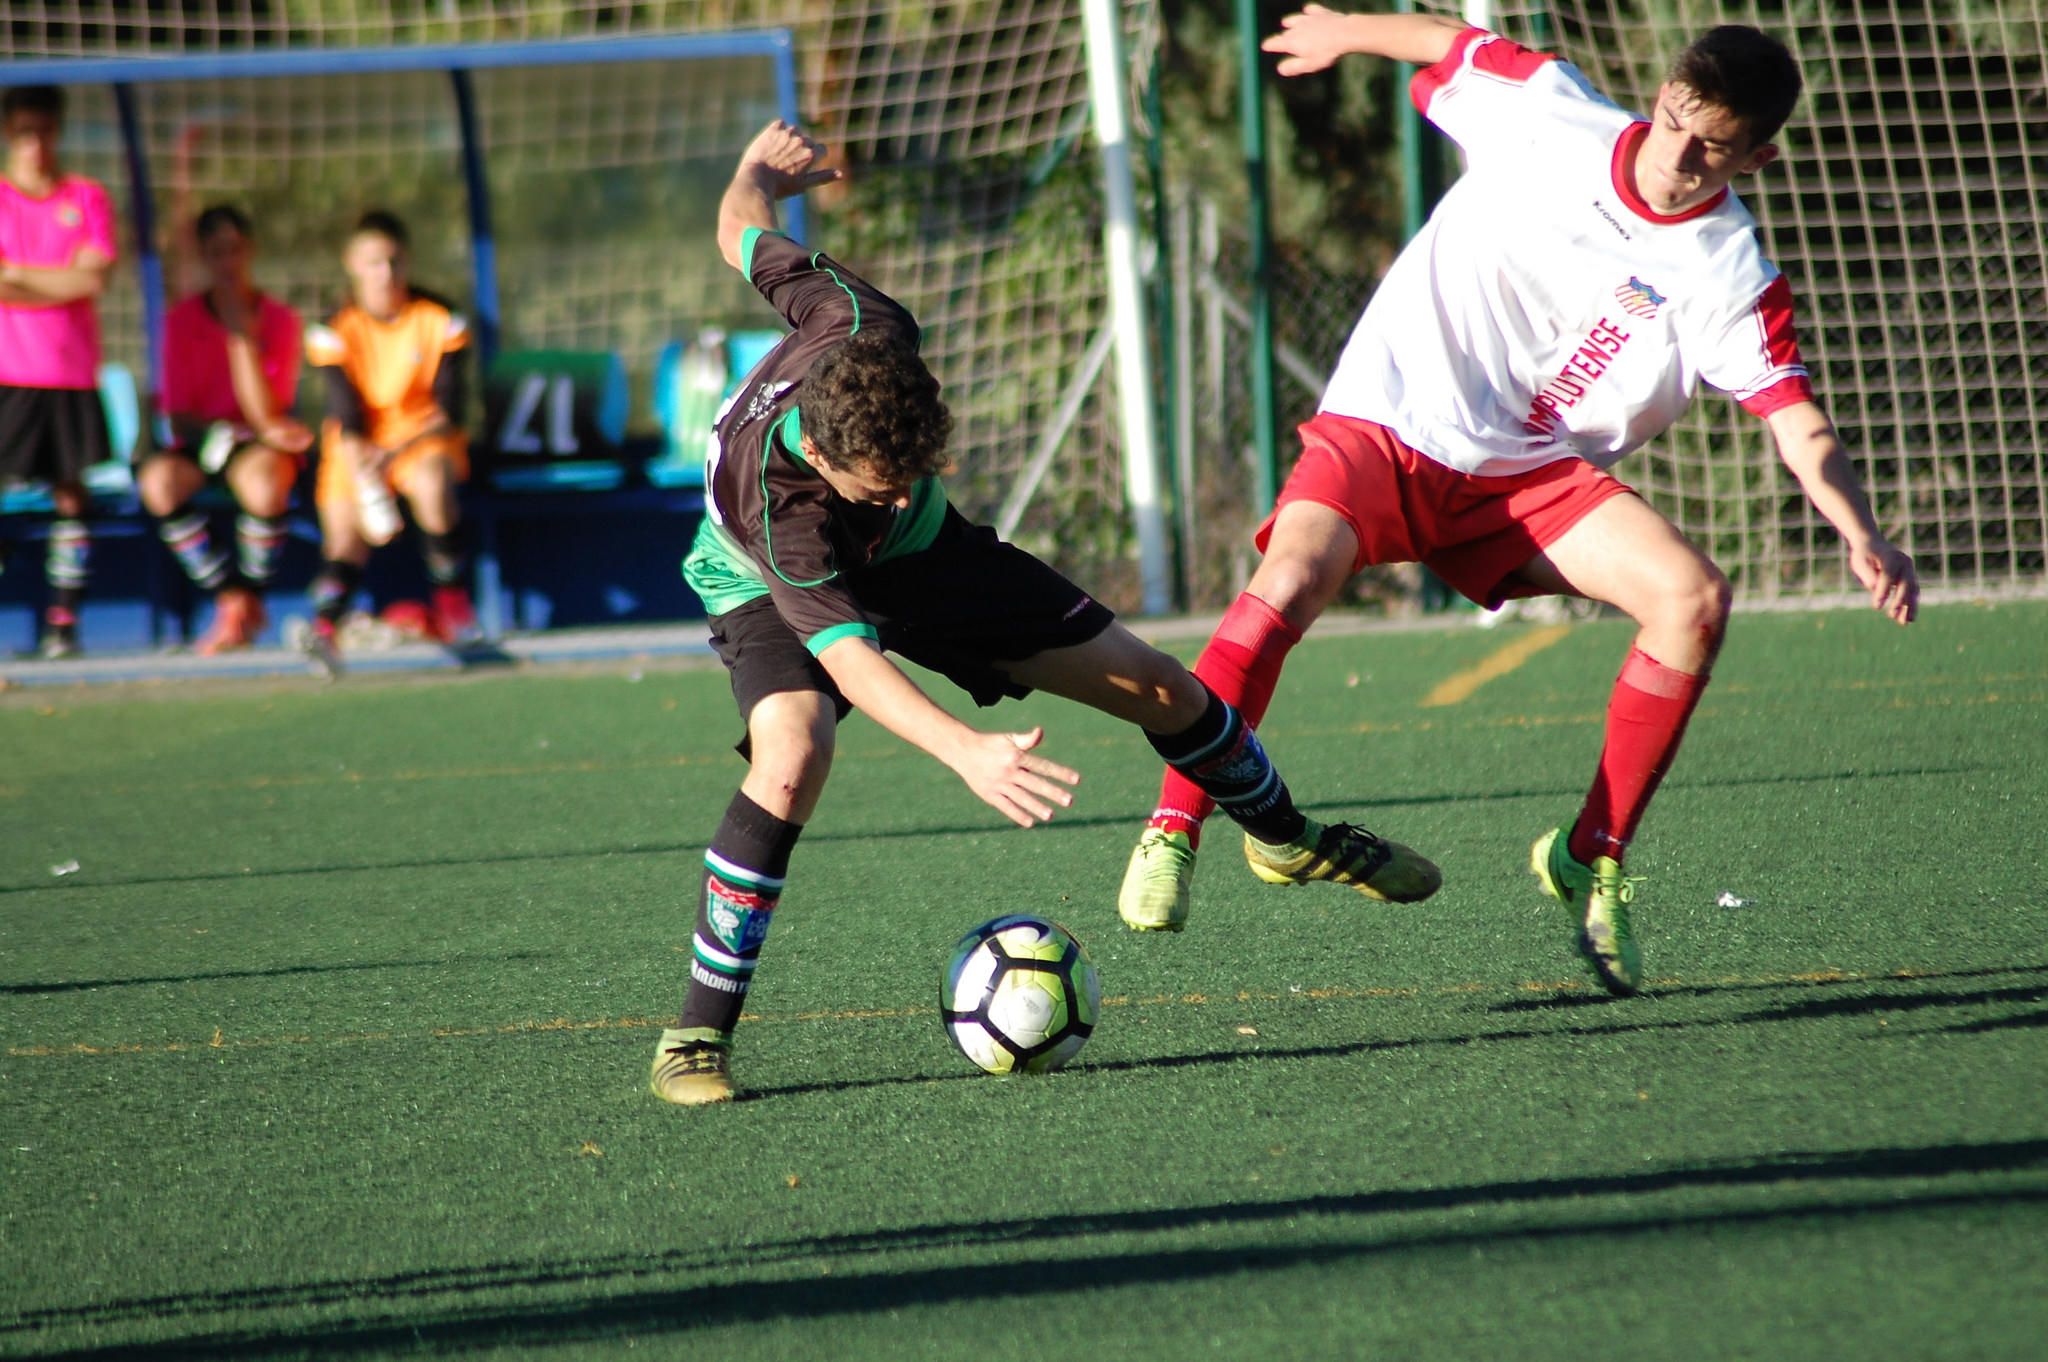 Fotos del partido AD Complutense Alcalá 4-0 Juvenil A